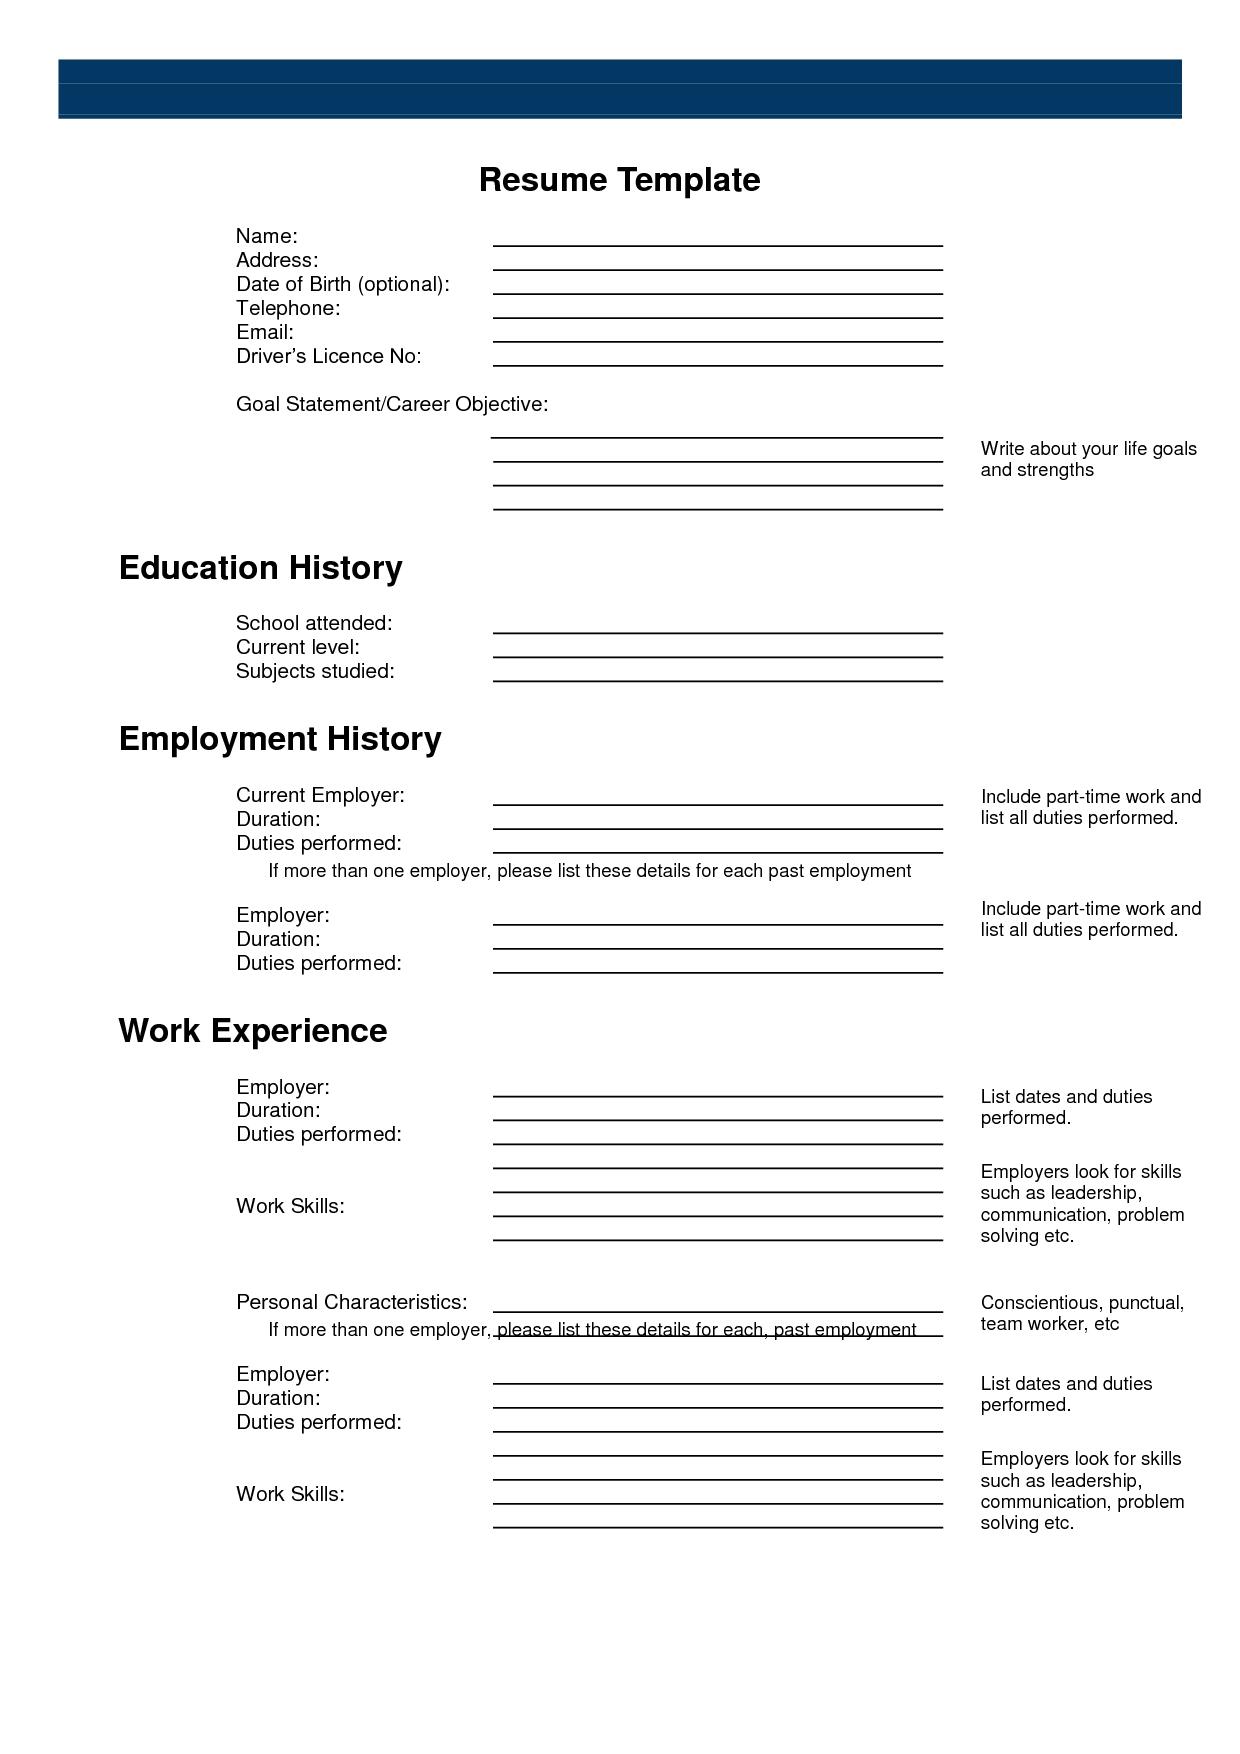 Resume Templates Online Free Printable - Free Resume Creator Online - Free Printable Resume Templates